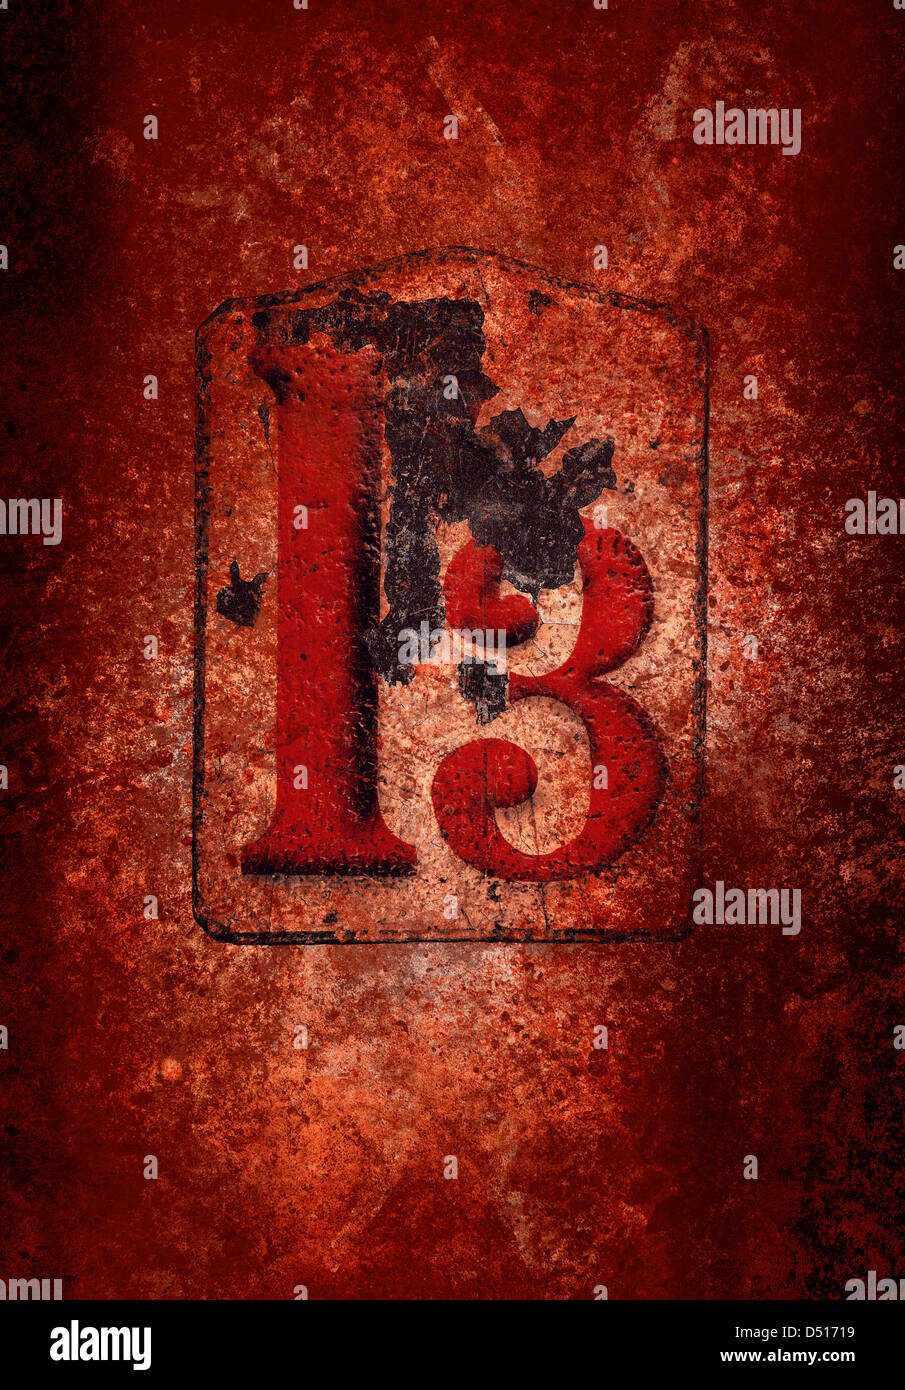 grunge 13 - Stock Image